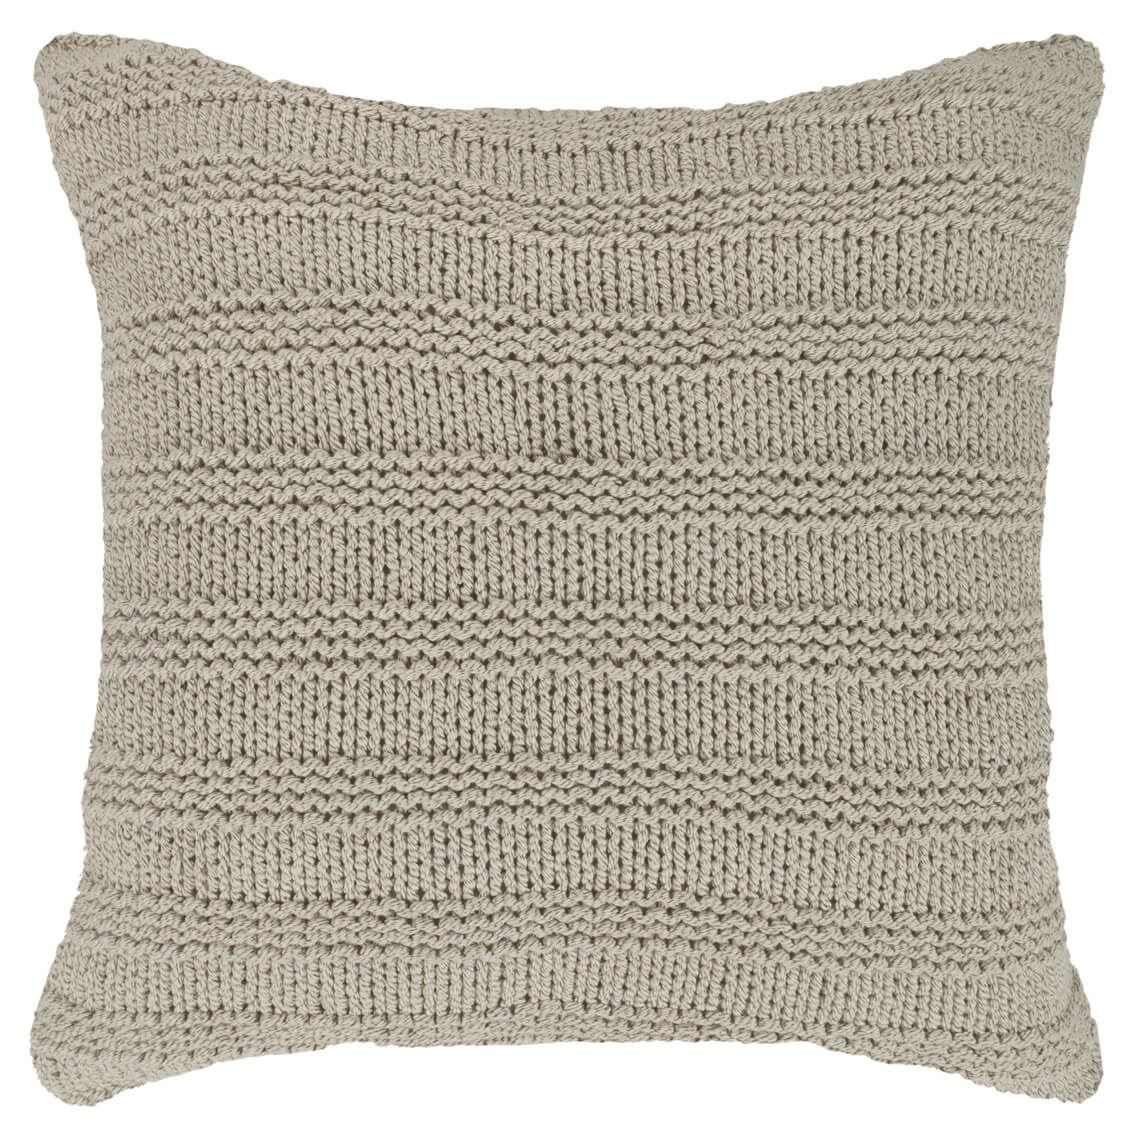 Dilalla Floor Cushion Size W 80cm x D 15cm x H 80cm in Natural Freedom